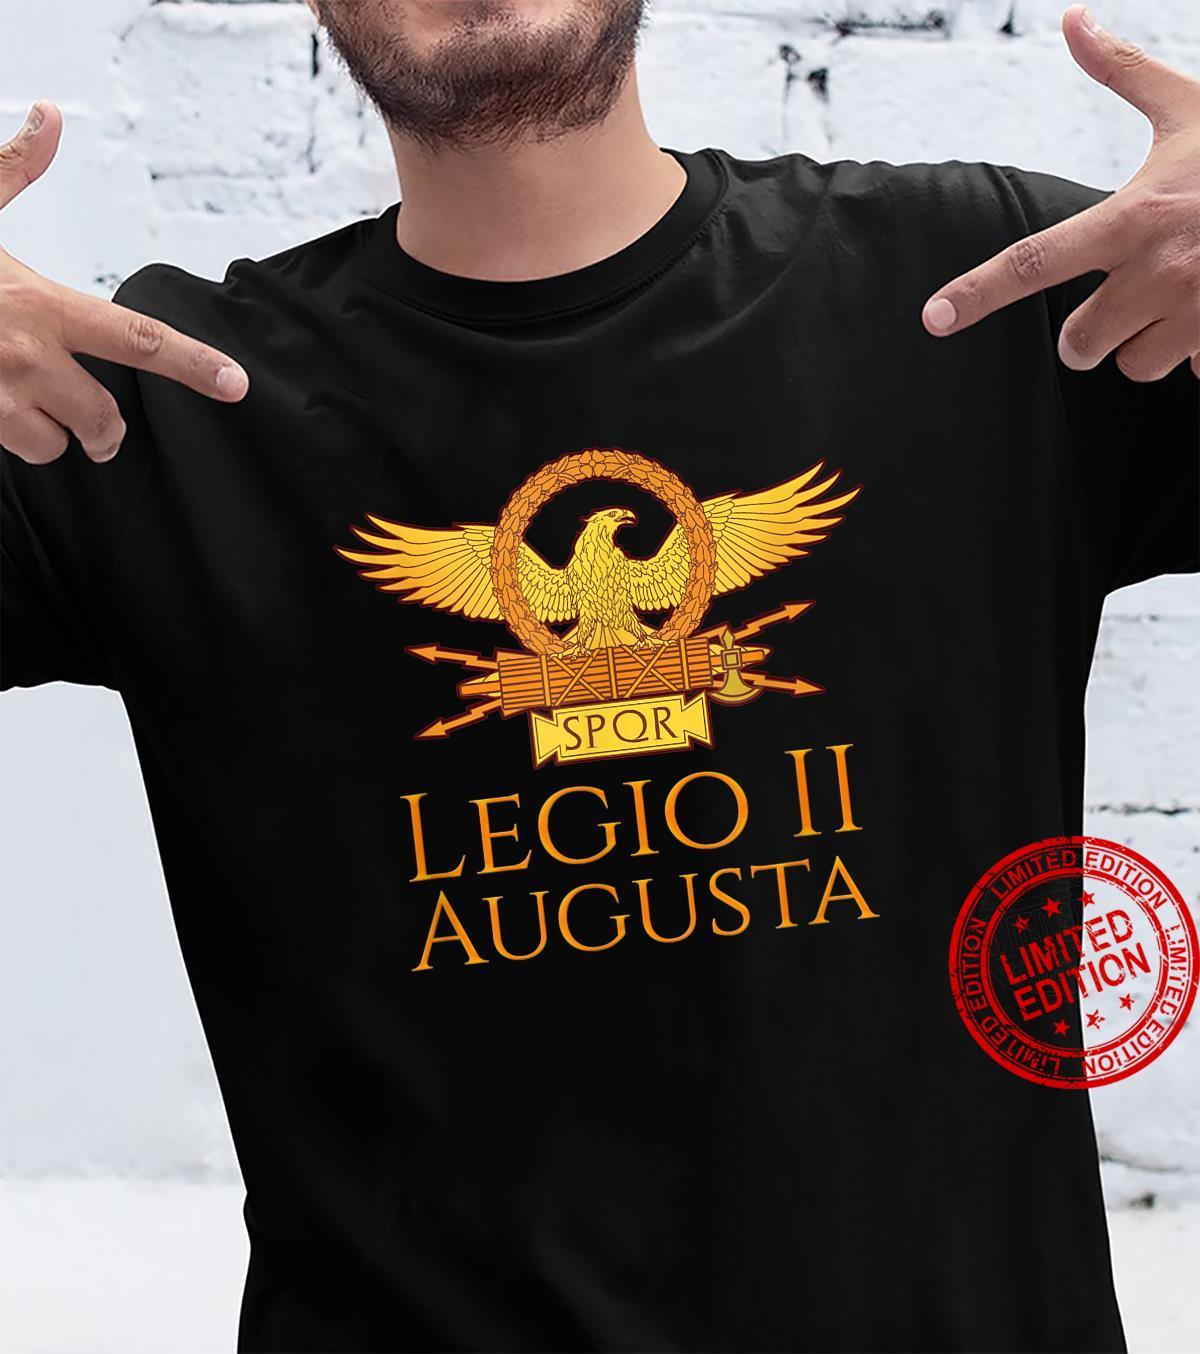 Legio II Augusta Ancient Roman Legion Military History Shirt